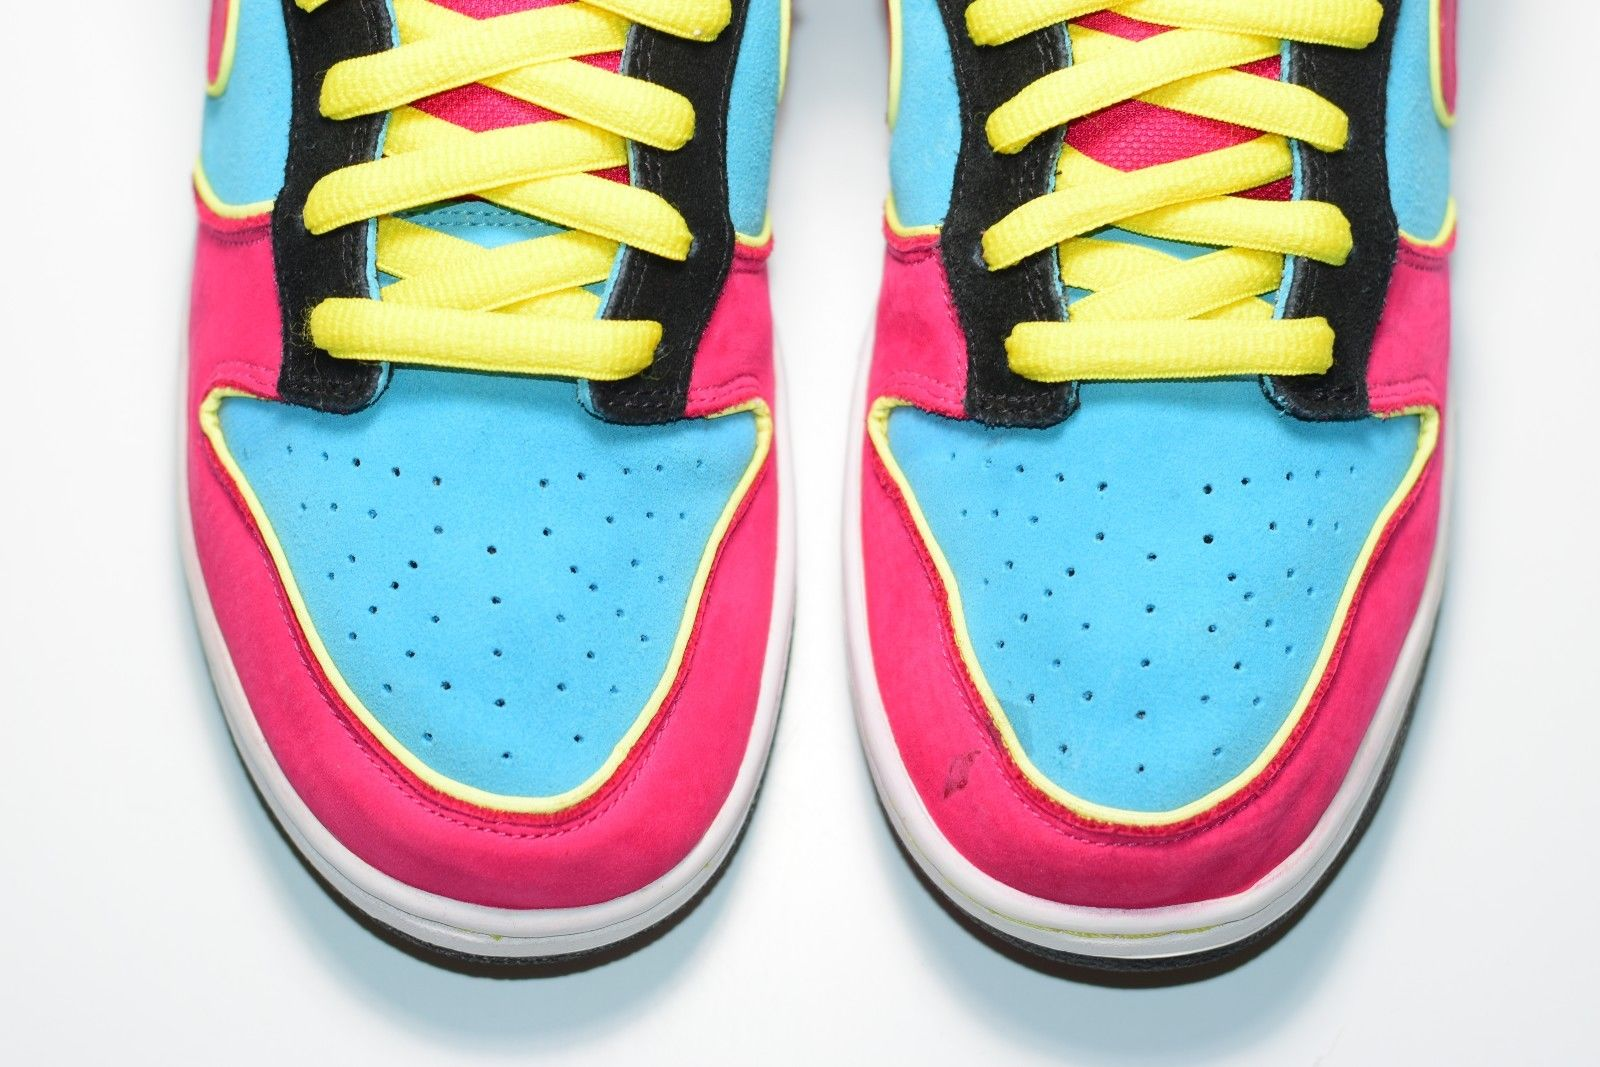 fde2e237ed90 Size 12 2009 Nike Dunk SB Low MS PAC MAN 313170-461